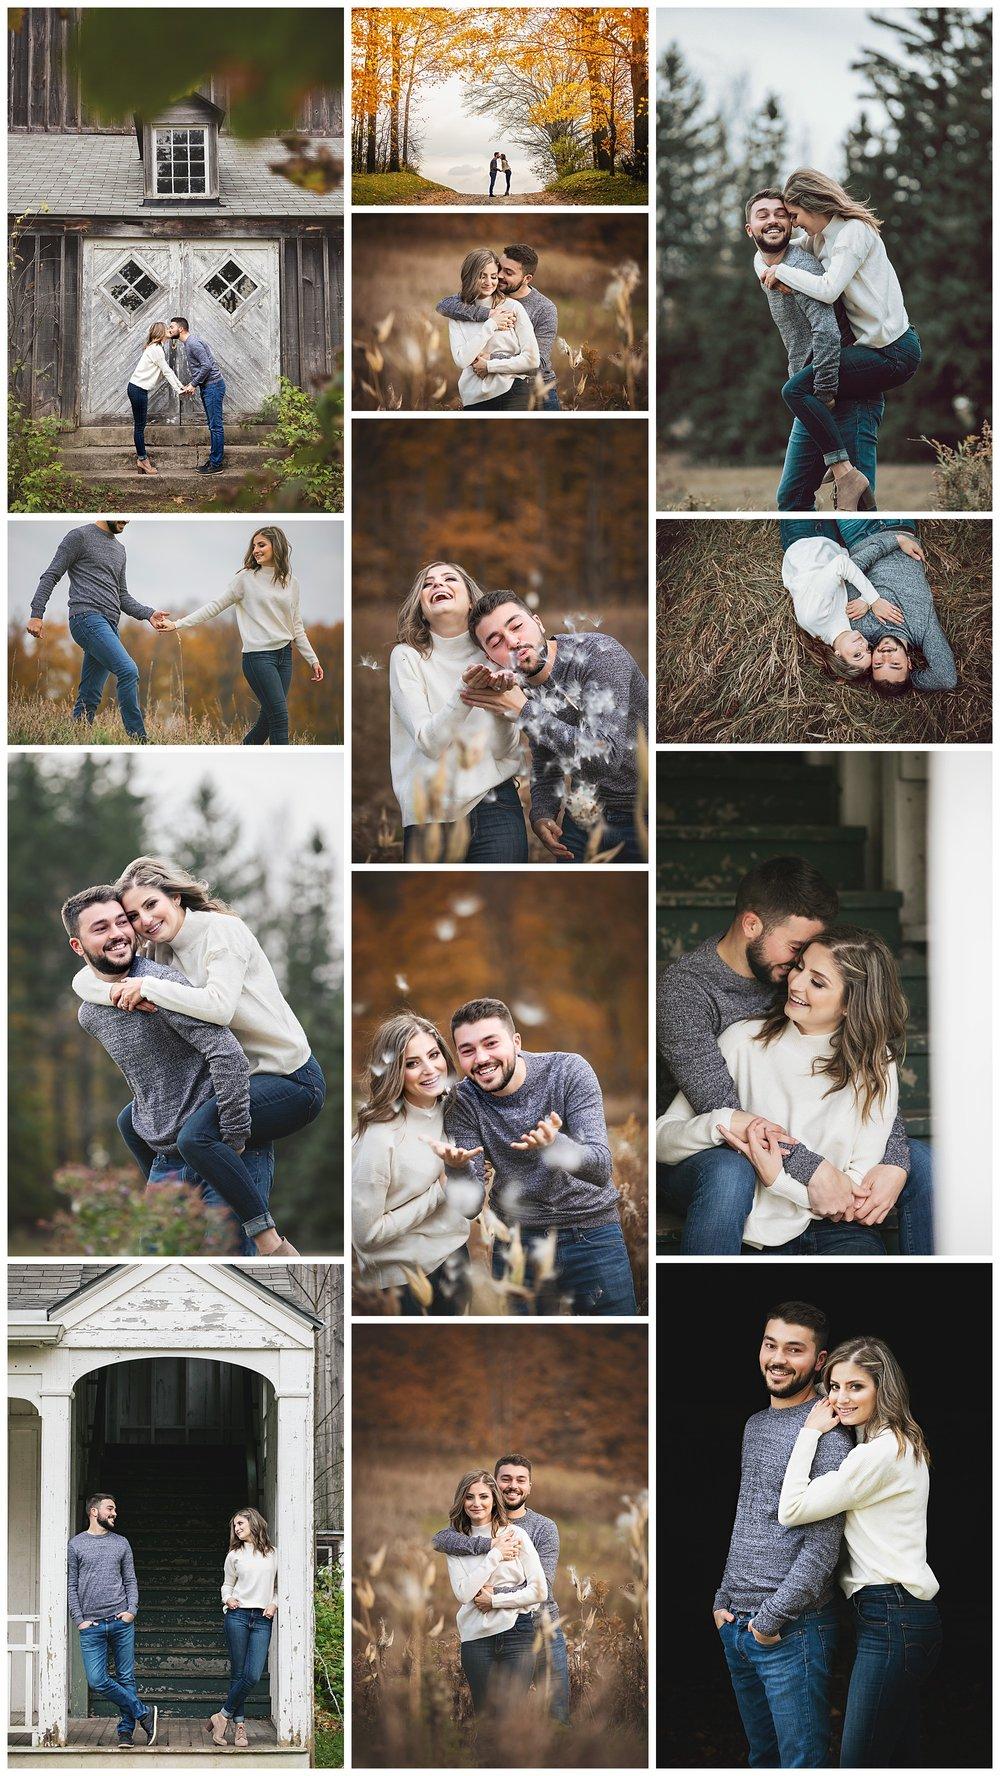 Scotsdale Farm, Halton Hills, Georgetown, Ontario engagement photography by VanDaele & Russell